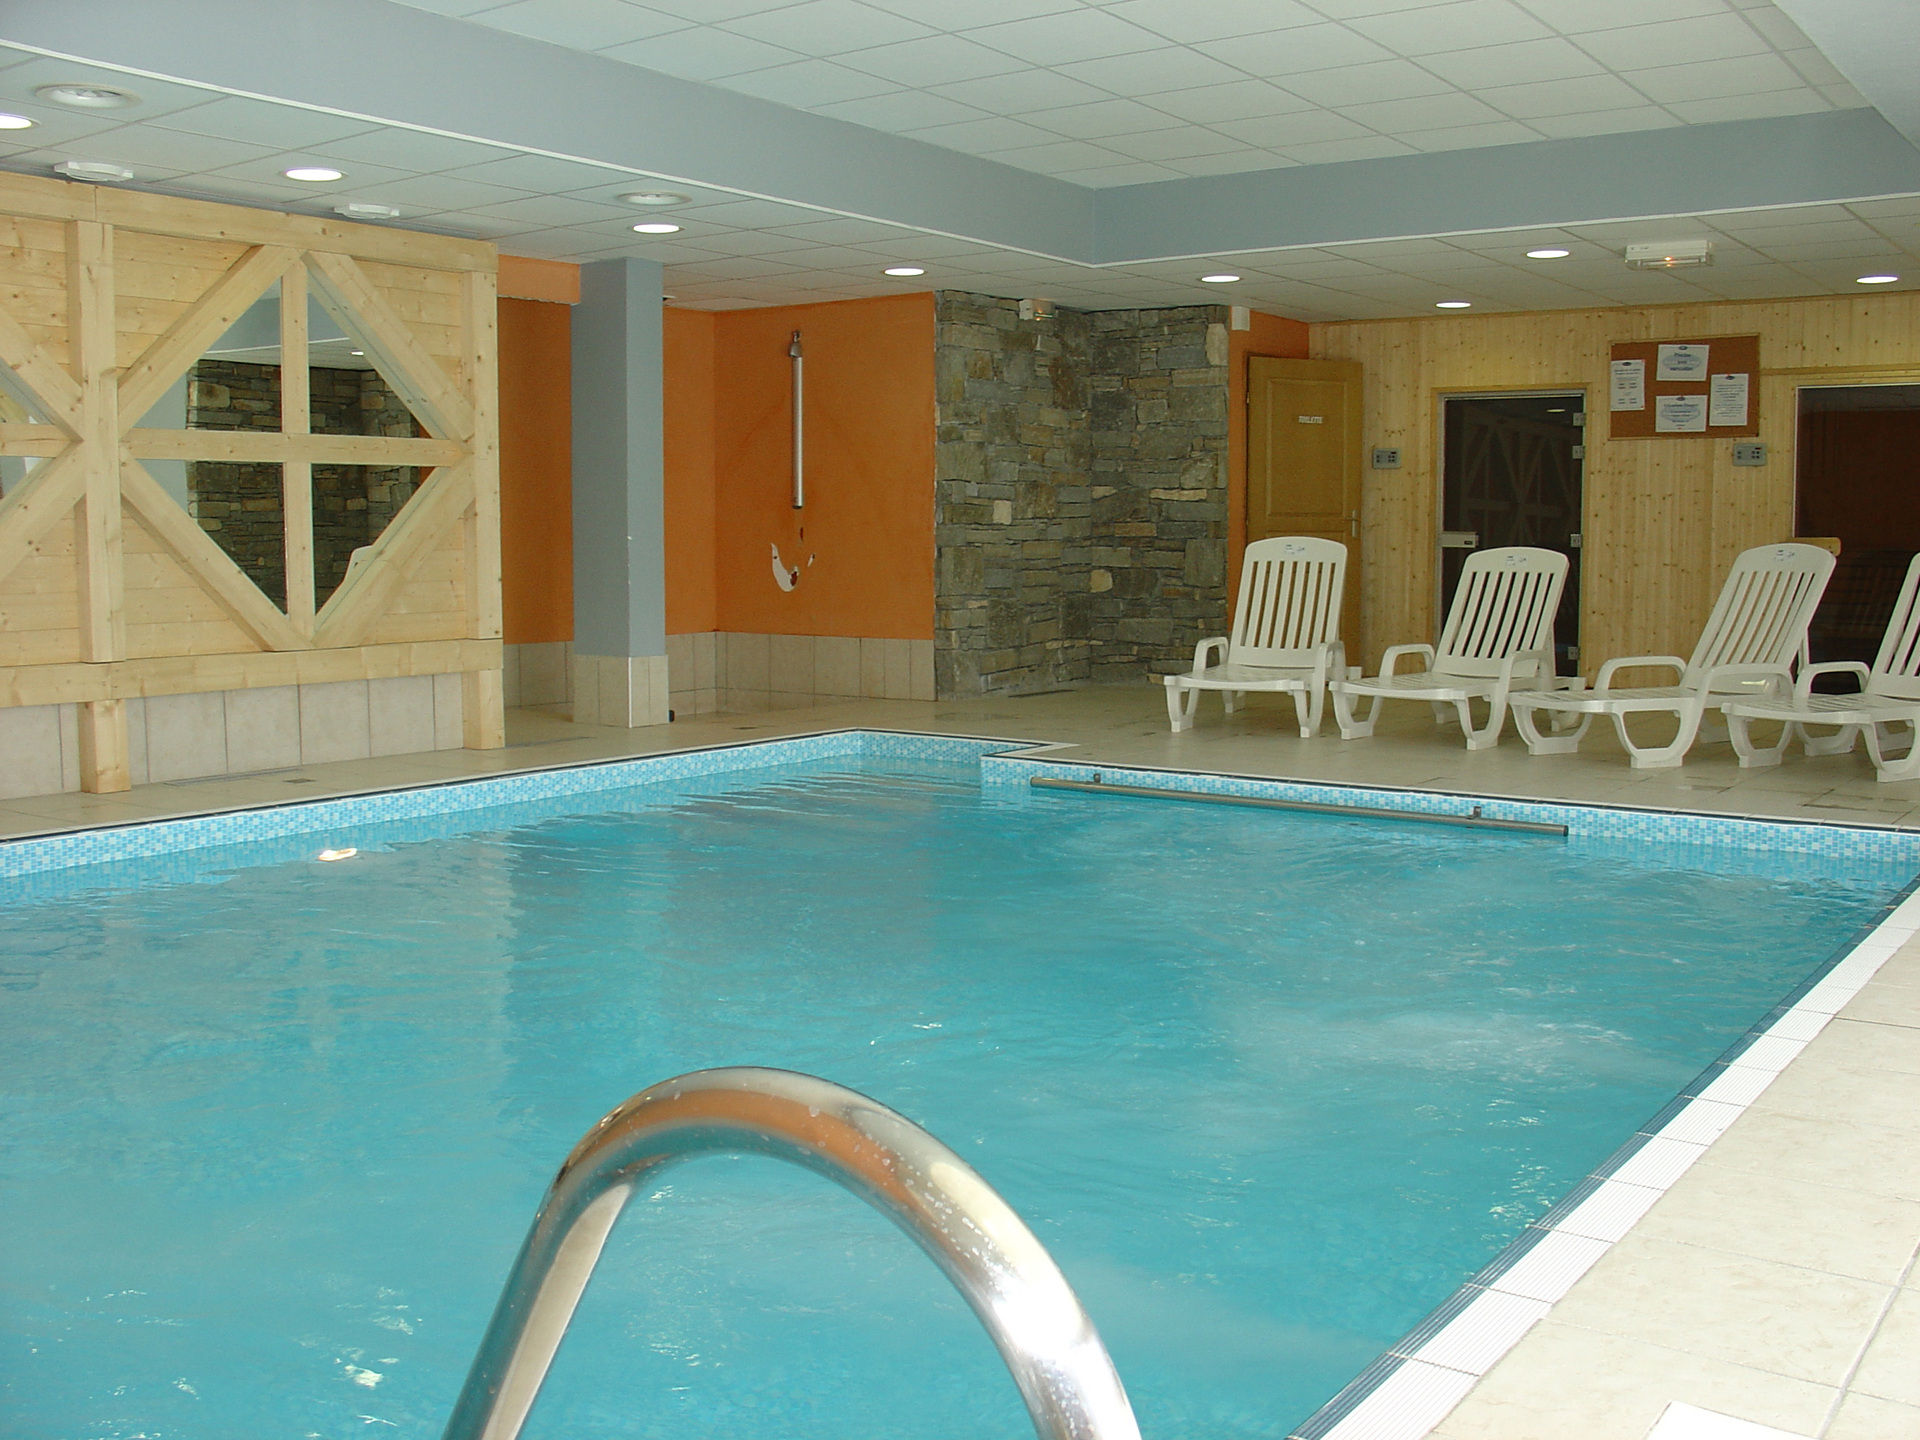 Residence les valmonts location auvergne rhone alpes avec - Location auvergne piscine ...